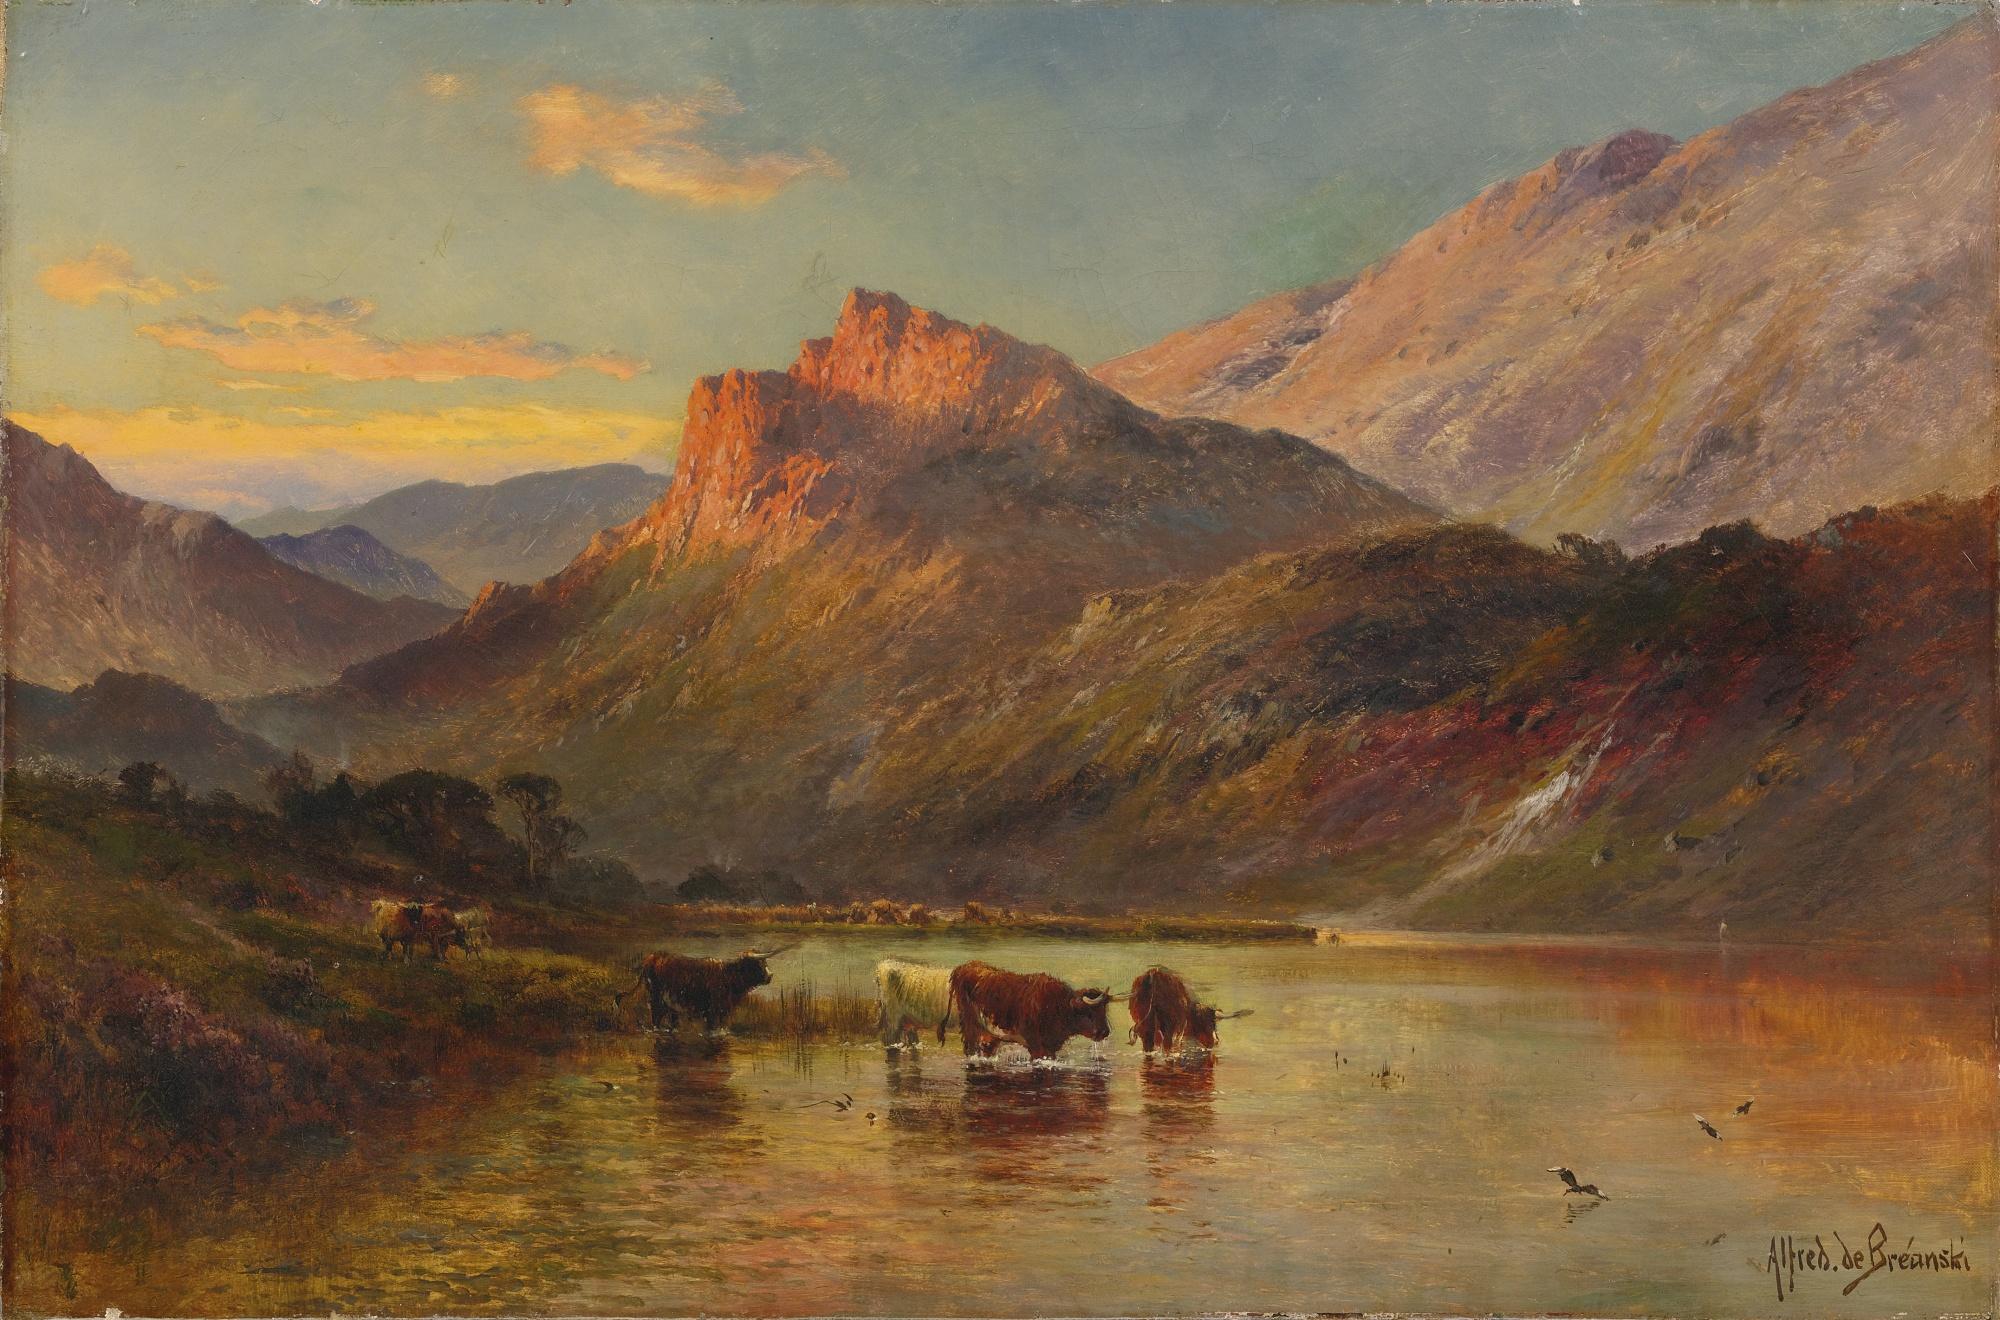 19th Century American Art History